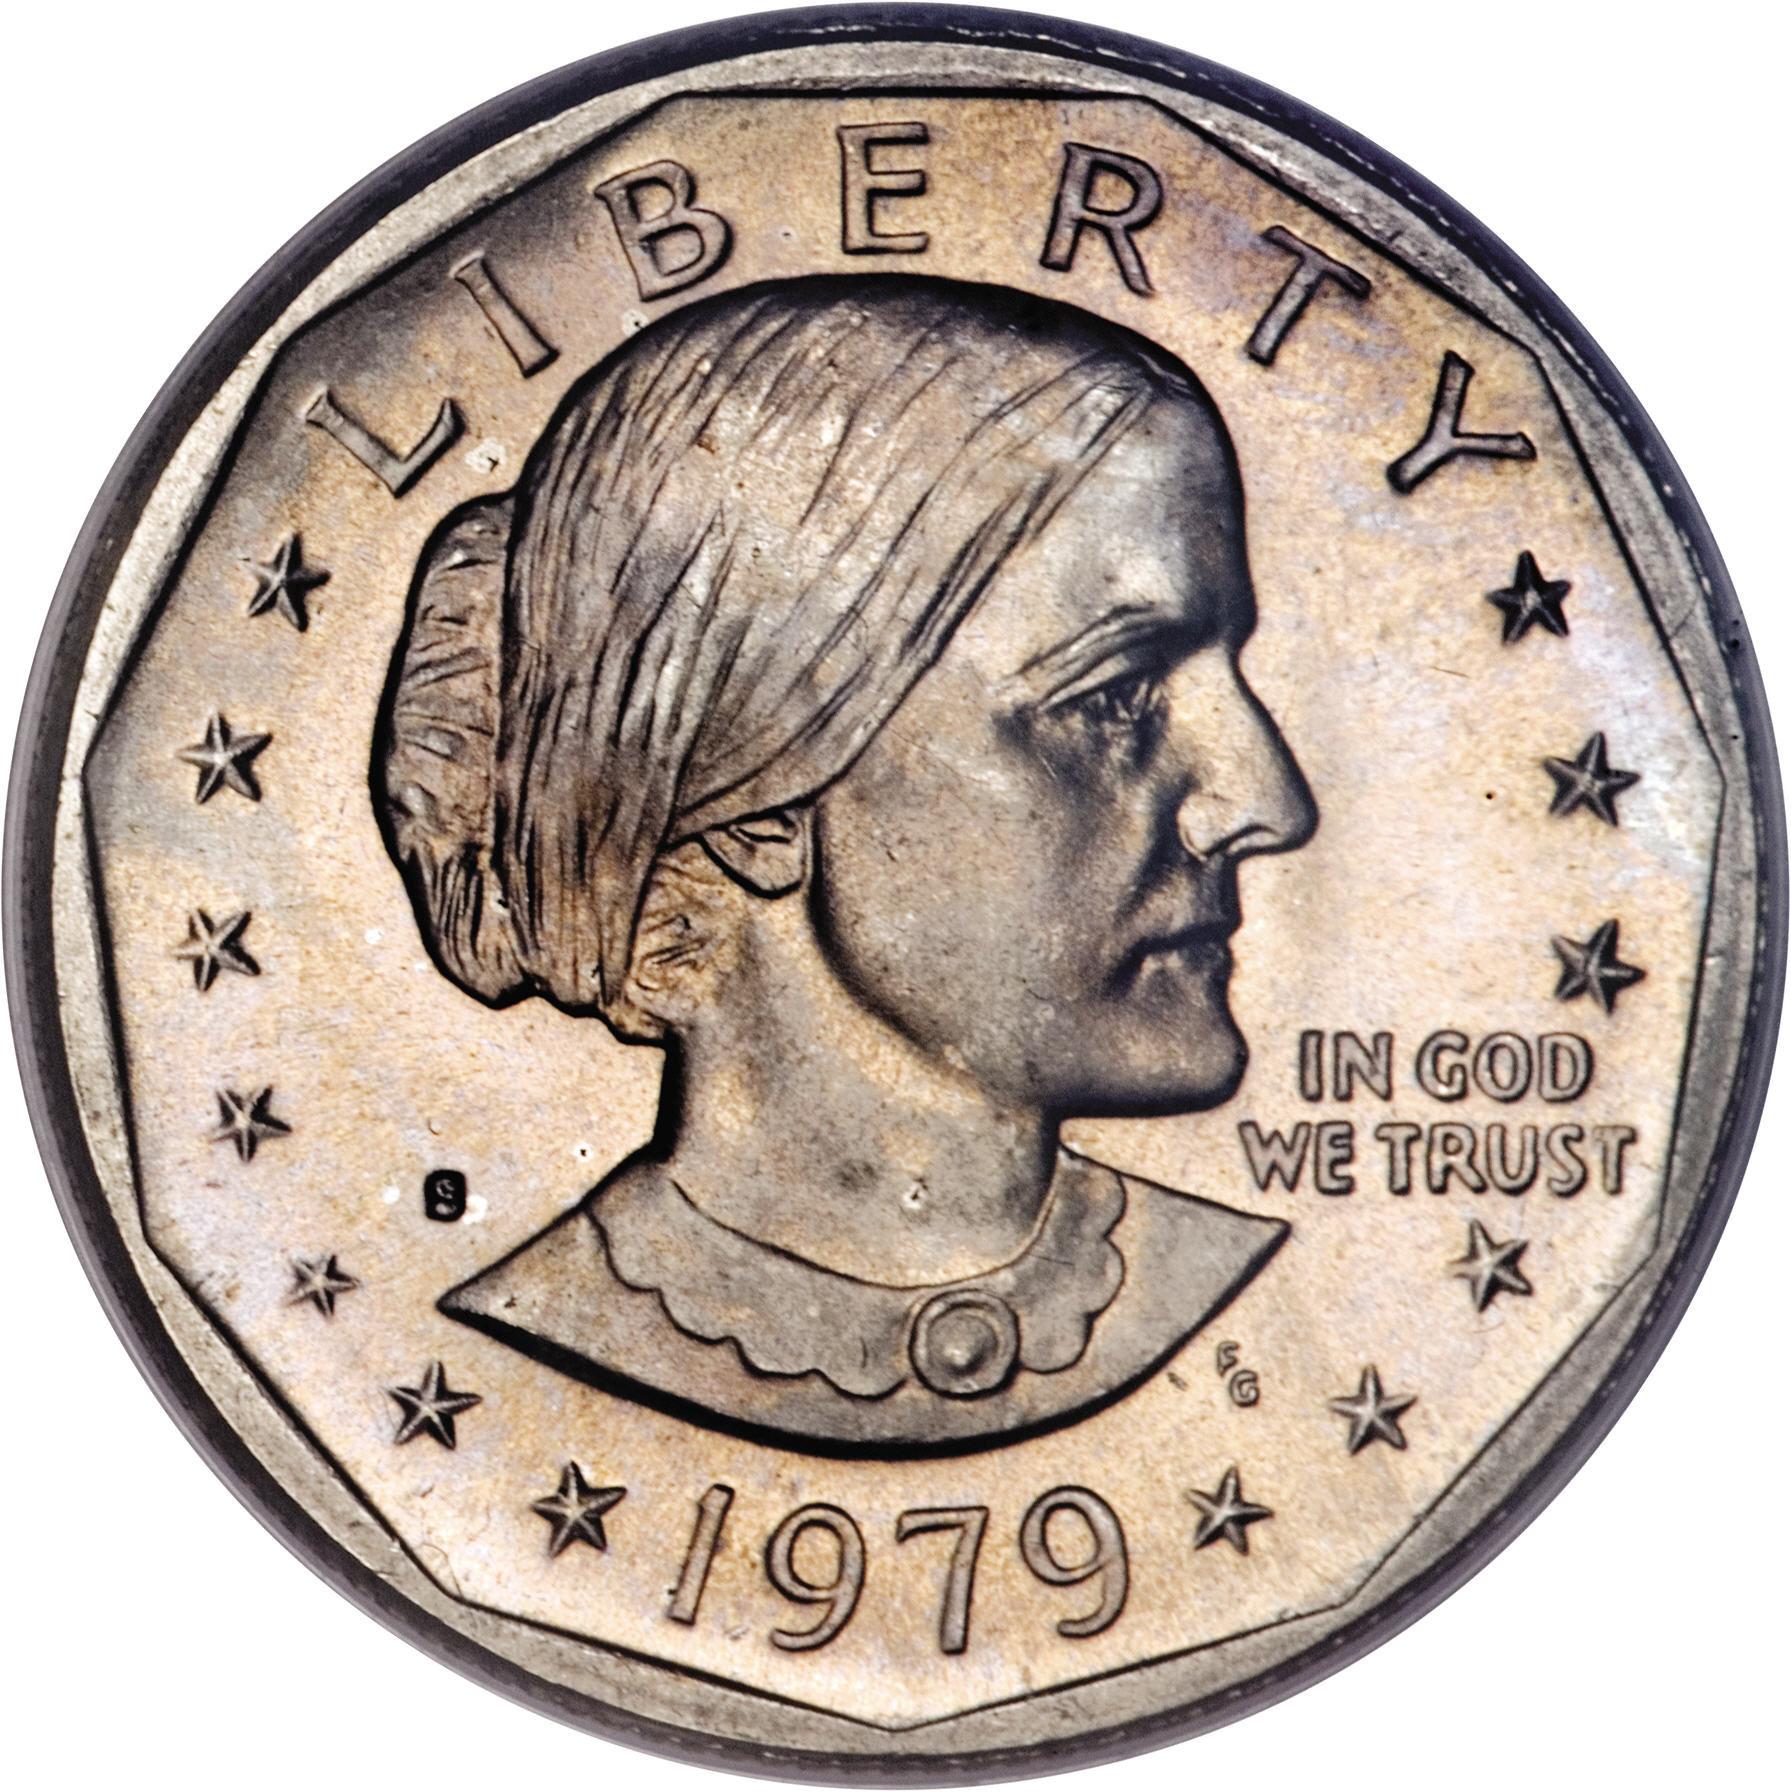 liberty 1979 dollar coin